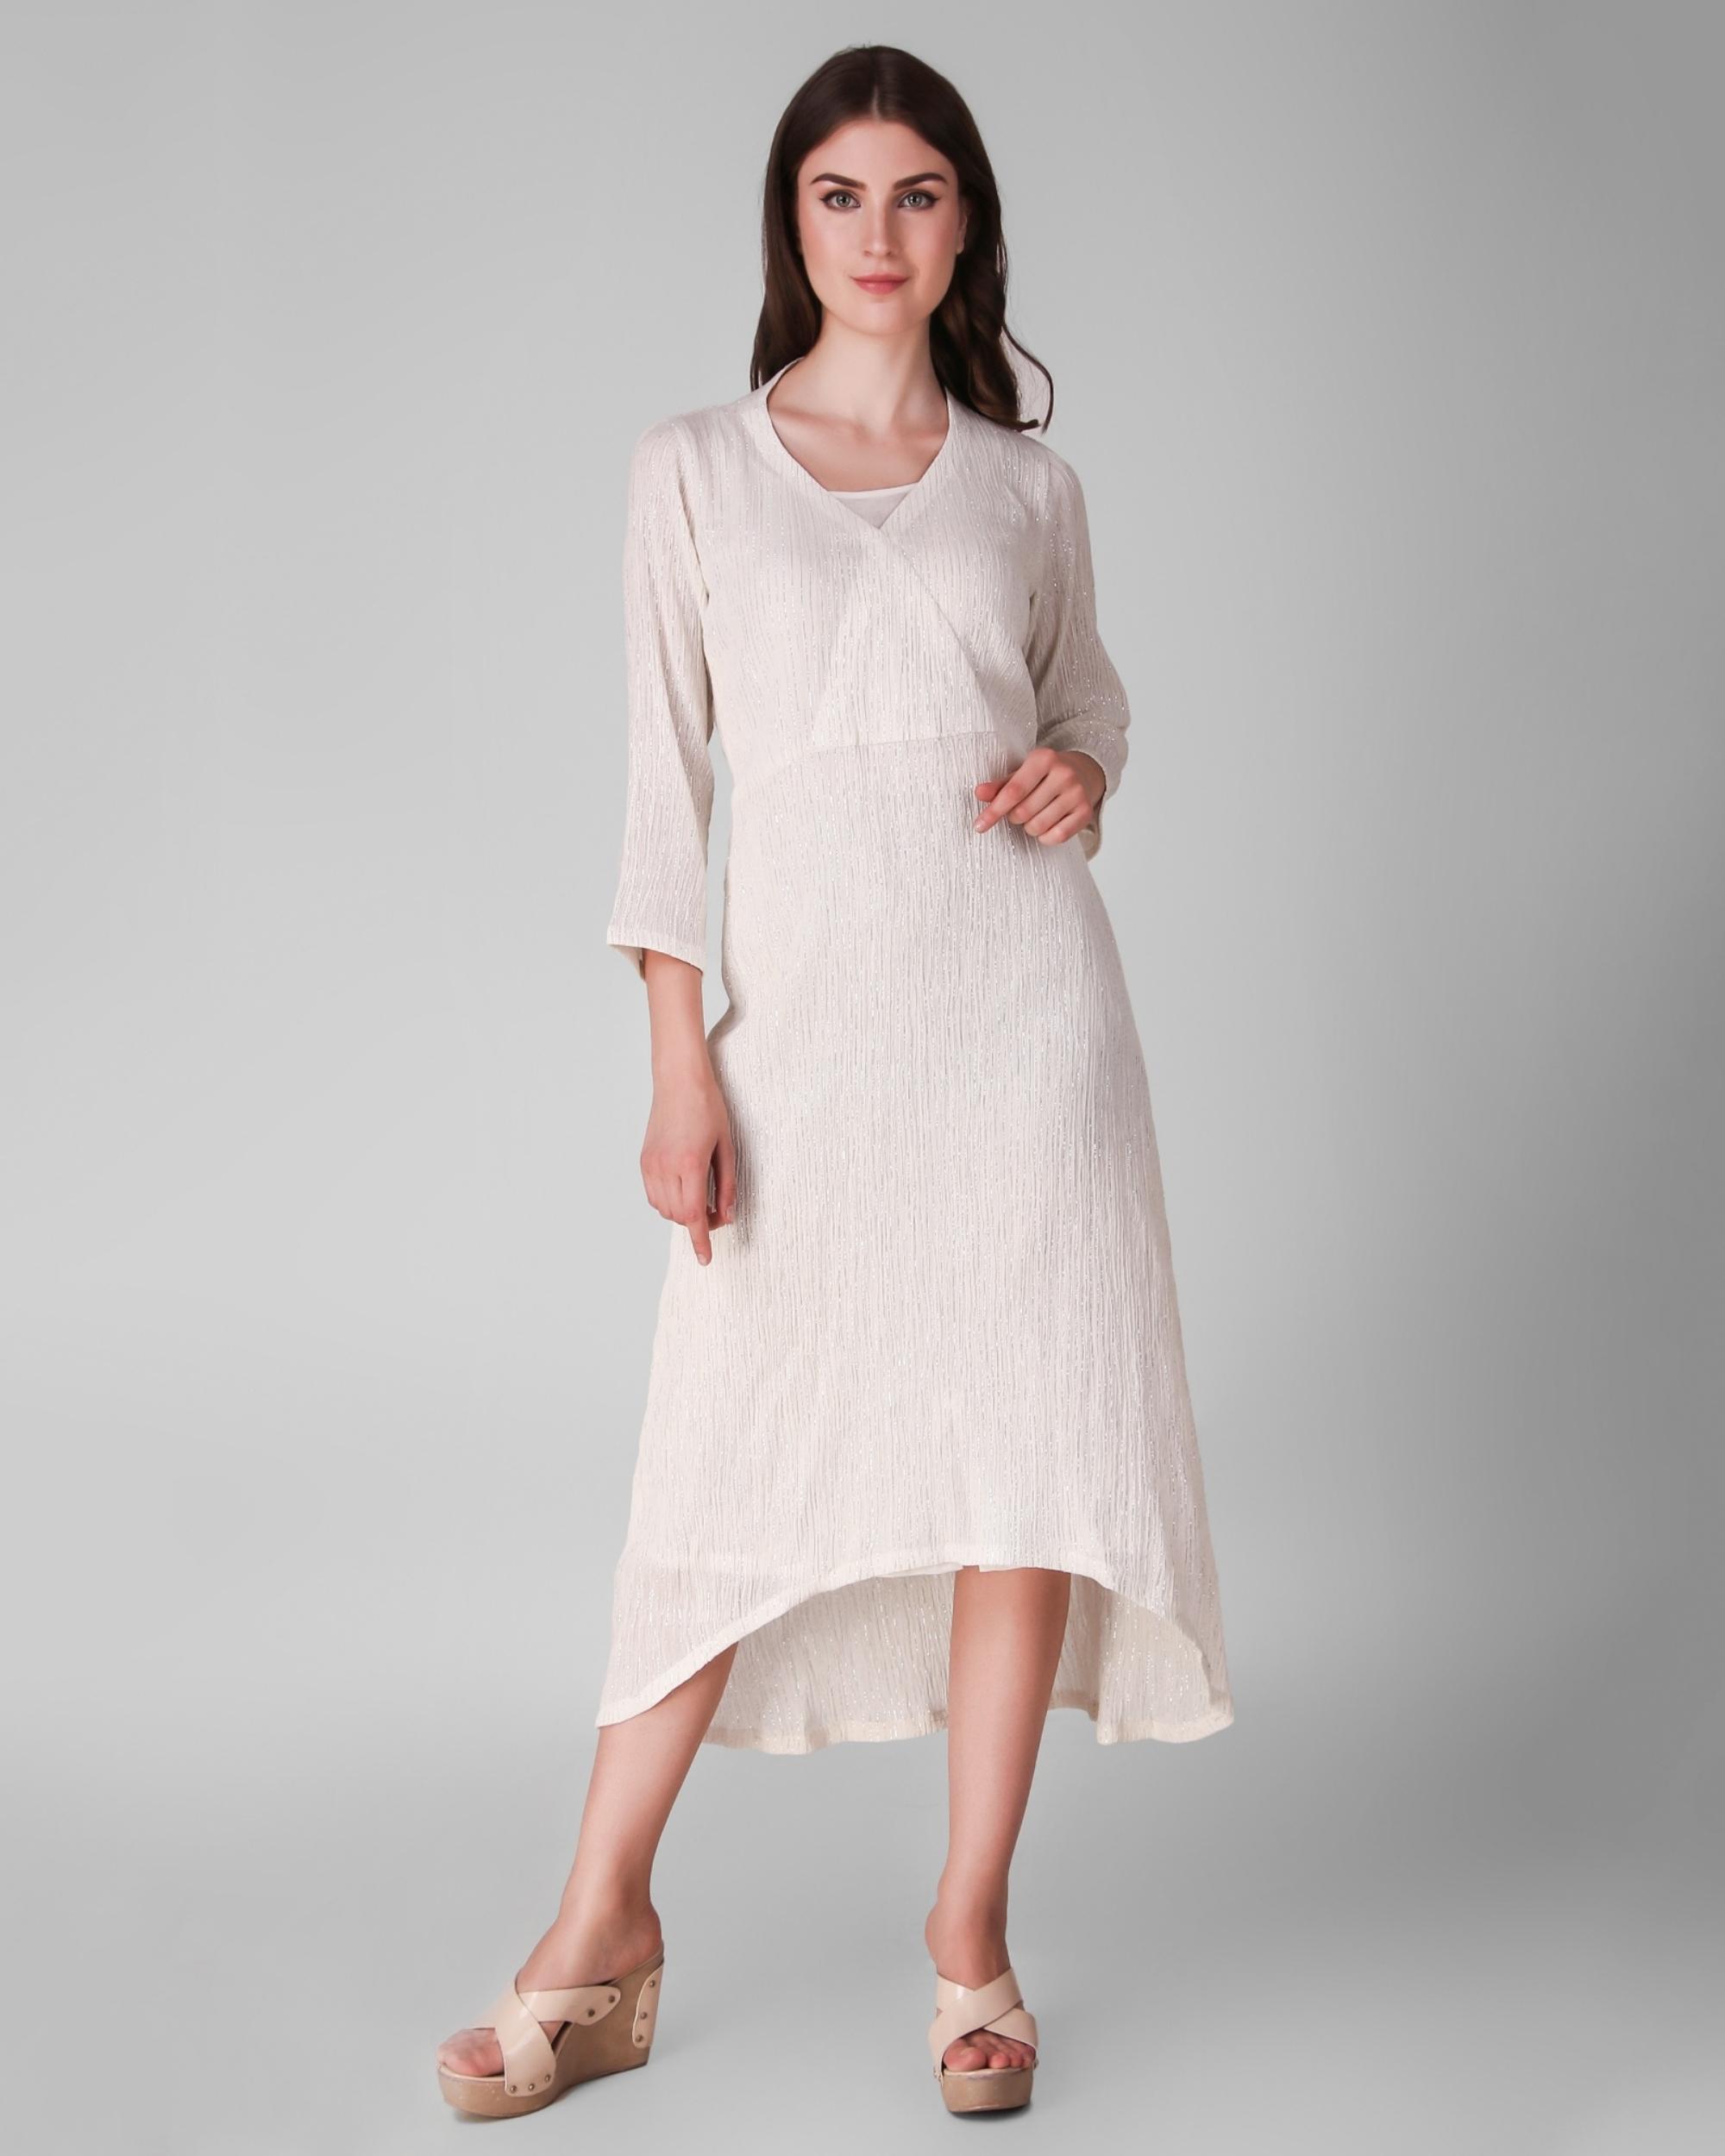 Ivory cotton crepe lurex asymmetrical dress - set of two